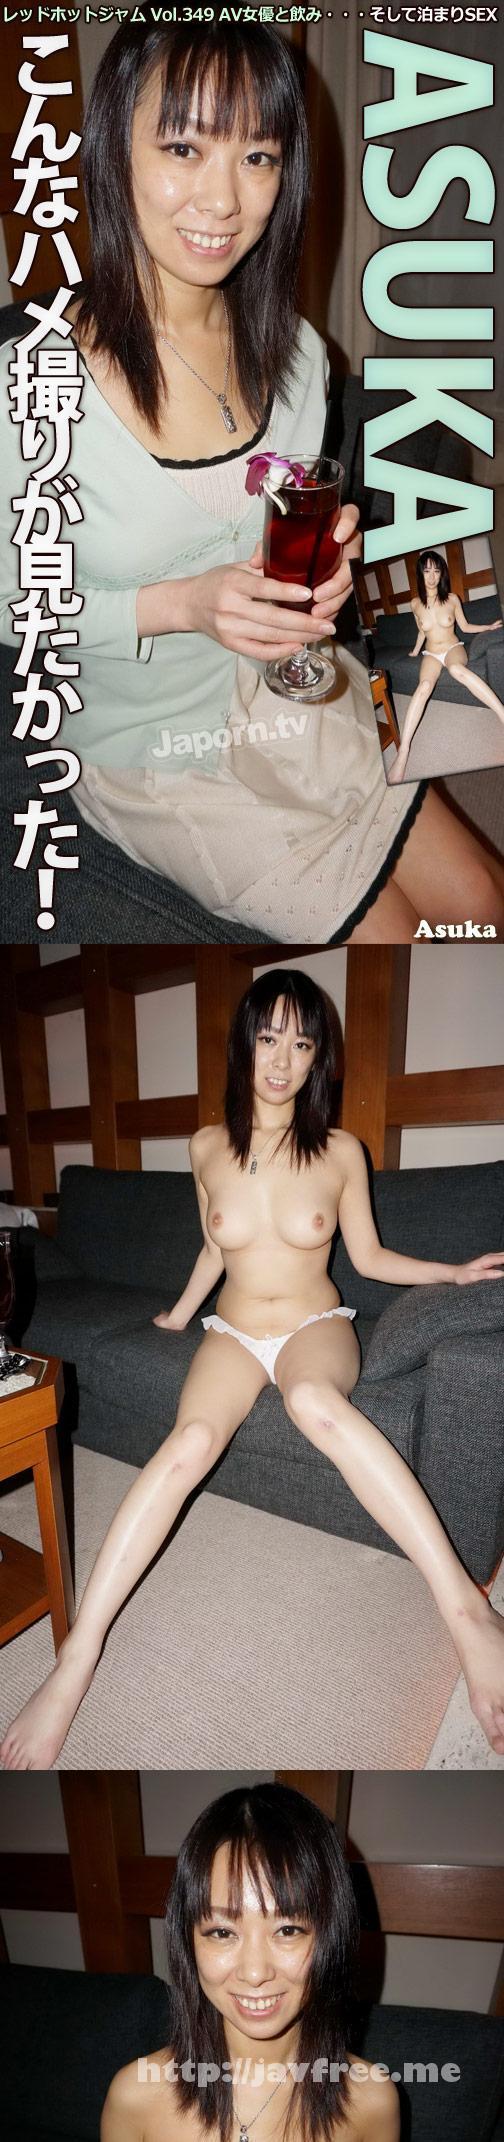 [RHJ 349] レッドホットジャム Vol.349 AV女優と飲み・・・そして泊まりSEX : ASUKA RHJ Asuka